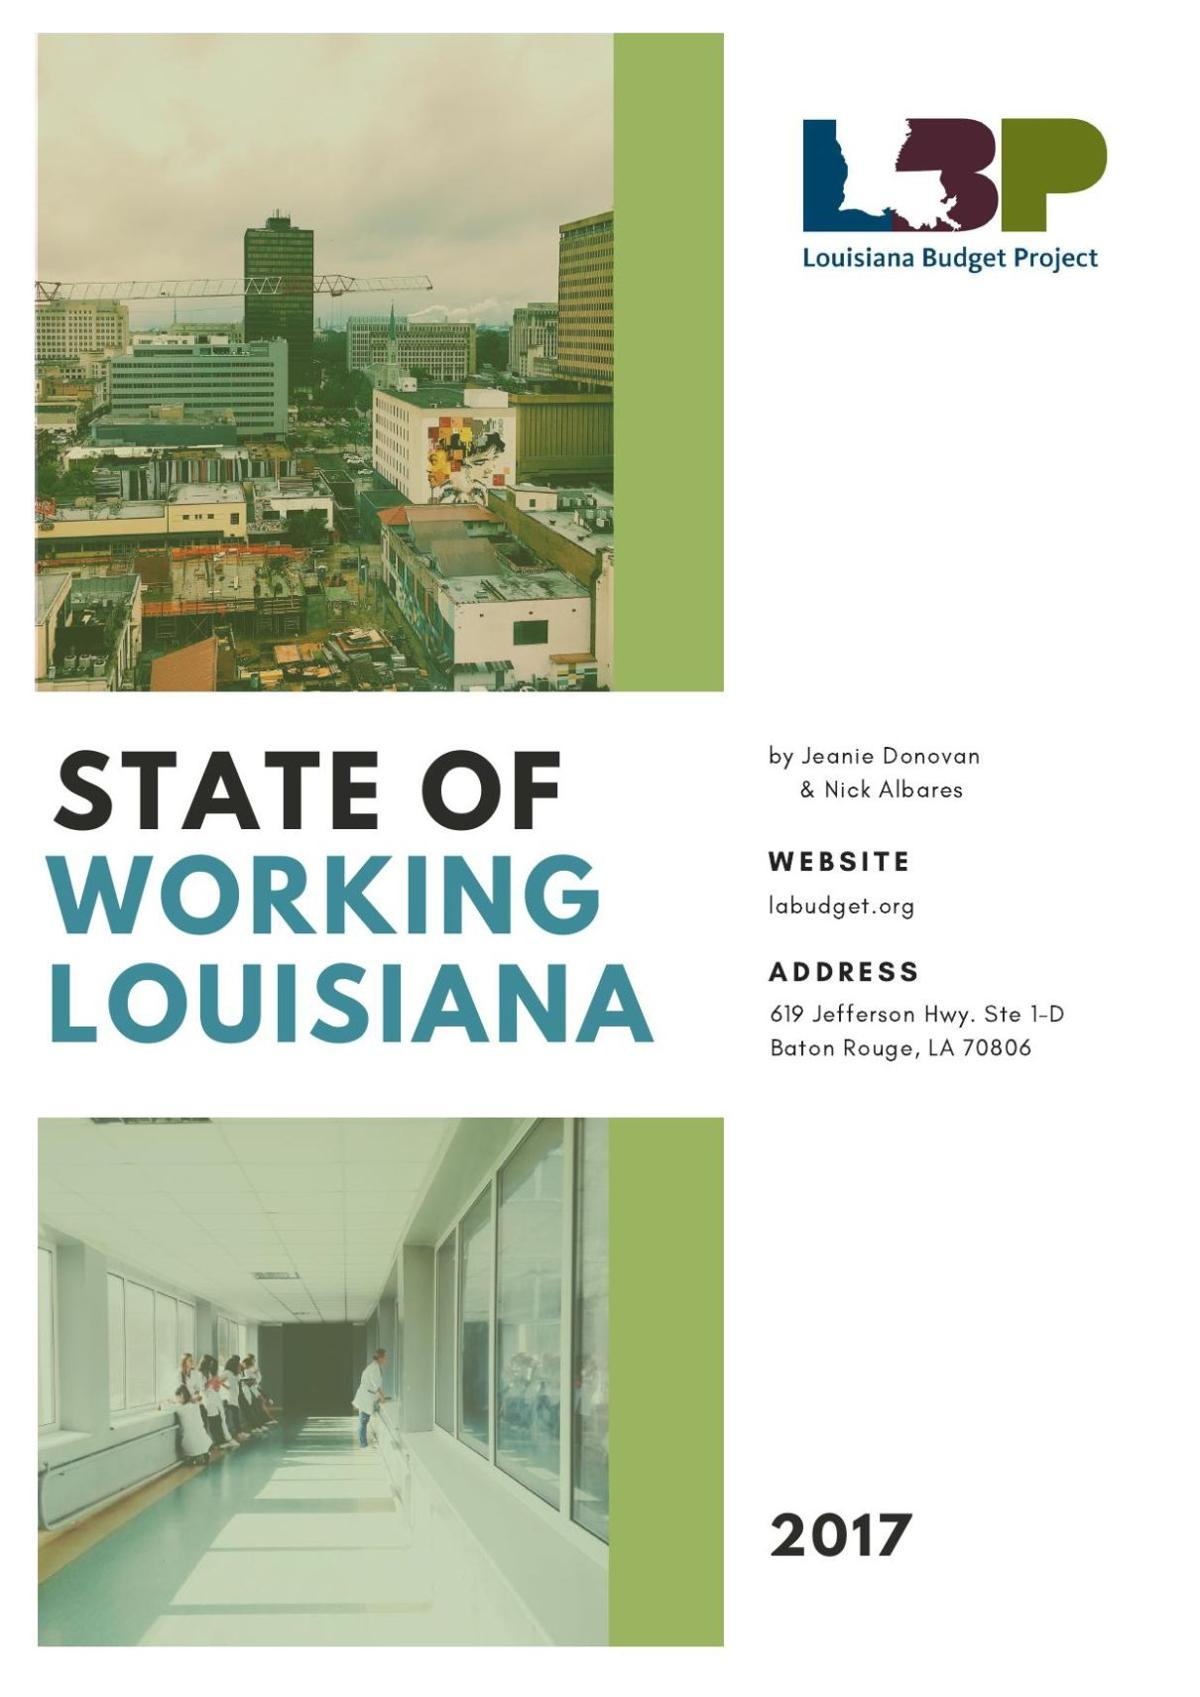 Louisiana Budget Project Jobs Report Sept. 7, 2017